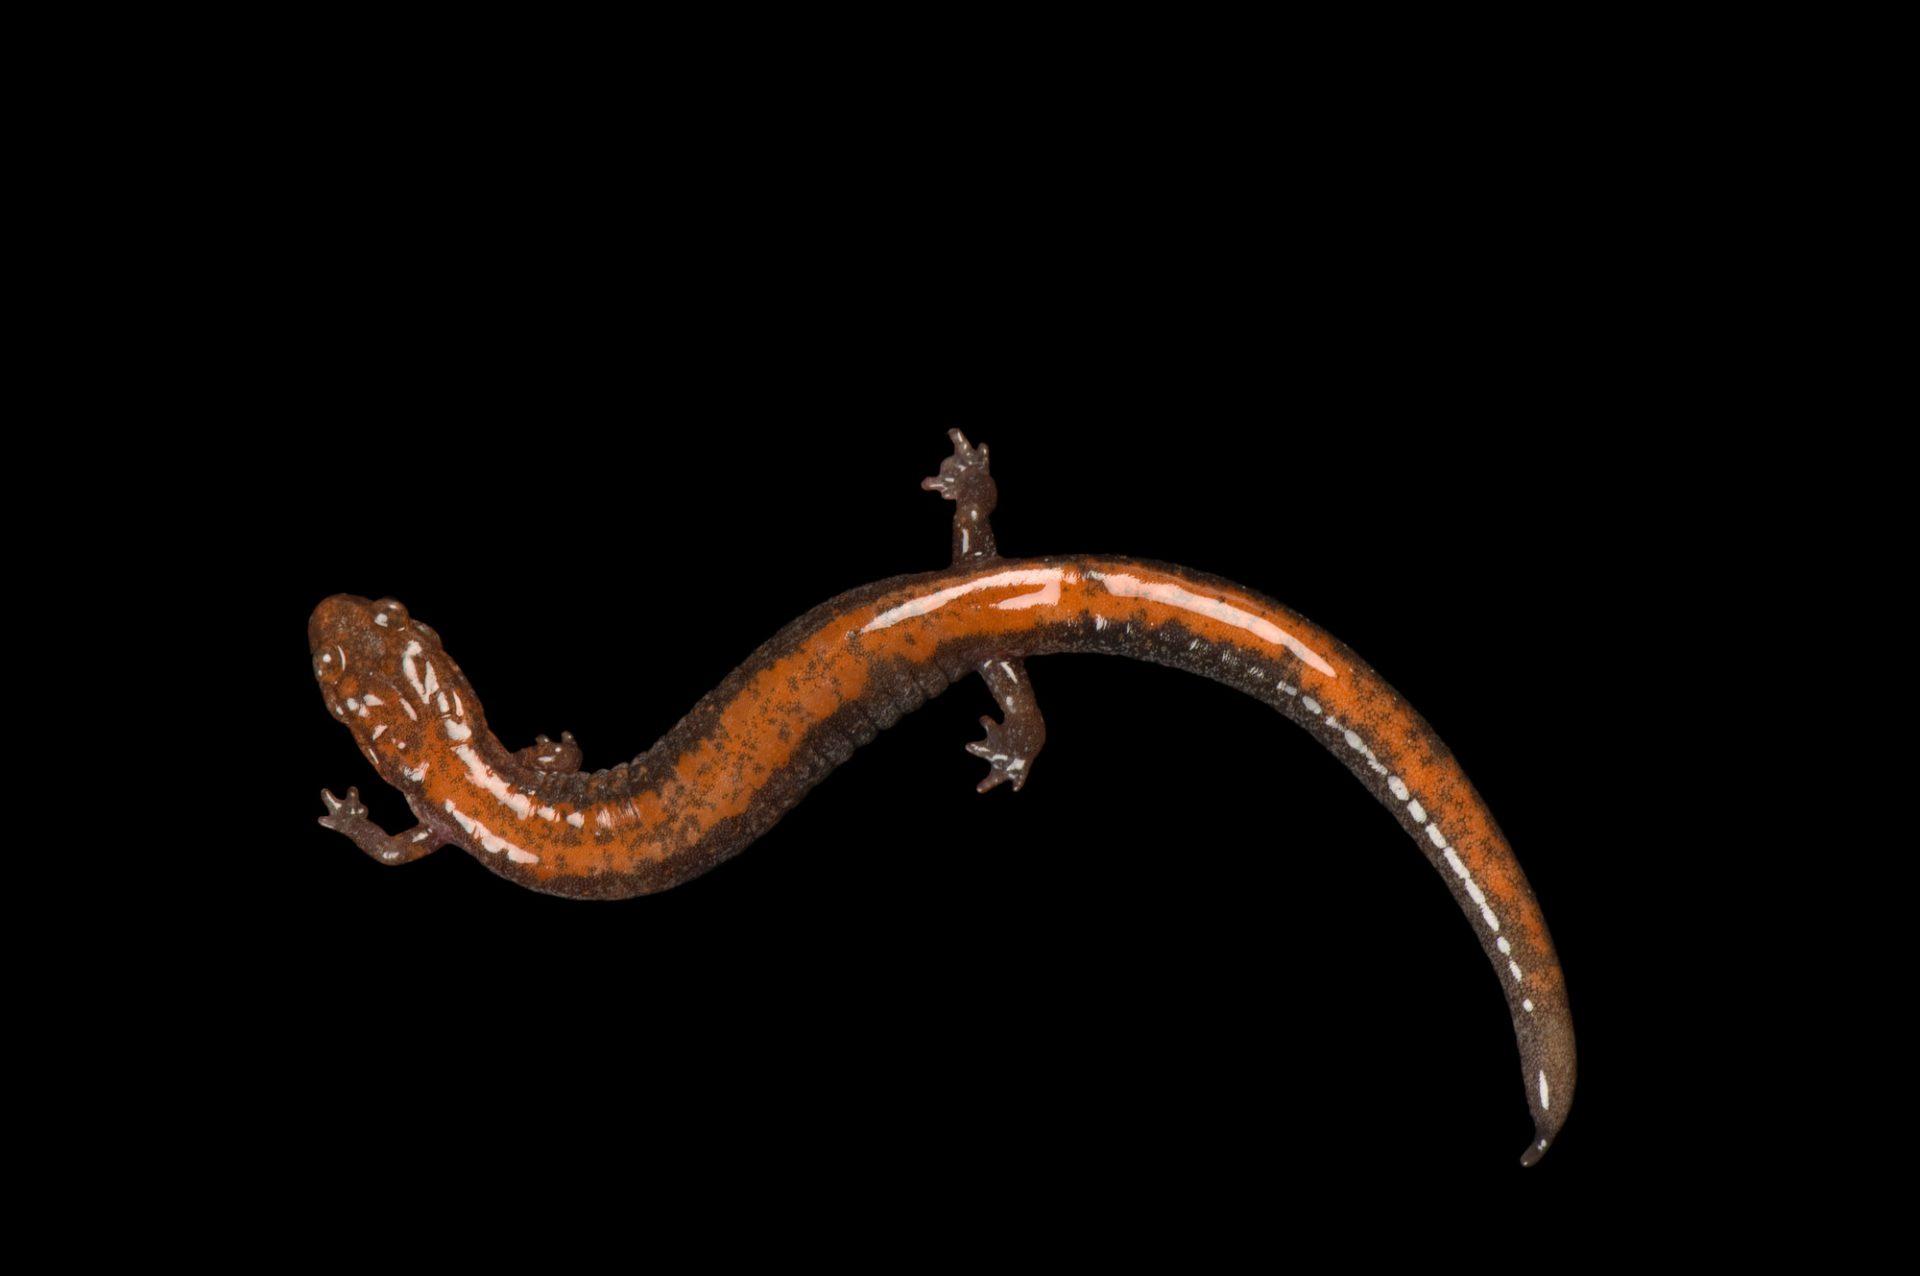 A redback salamander (Plethodon cinereus) at the National Mississippi River Museum and Aquarium, Dubuque, Iowa.